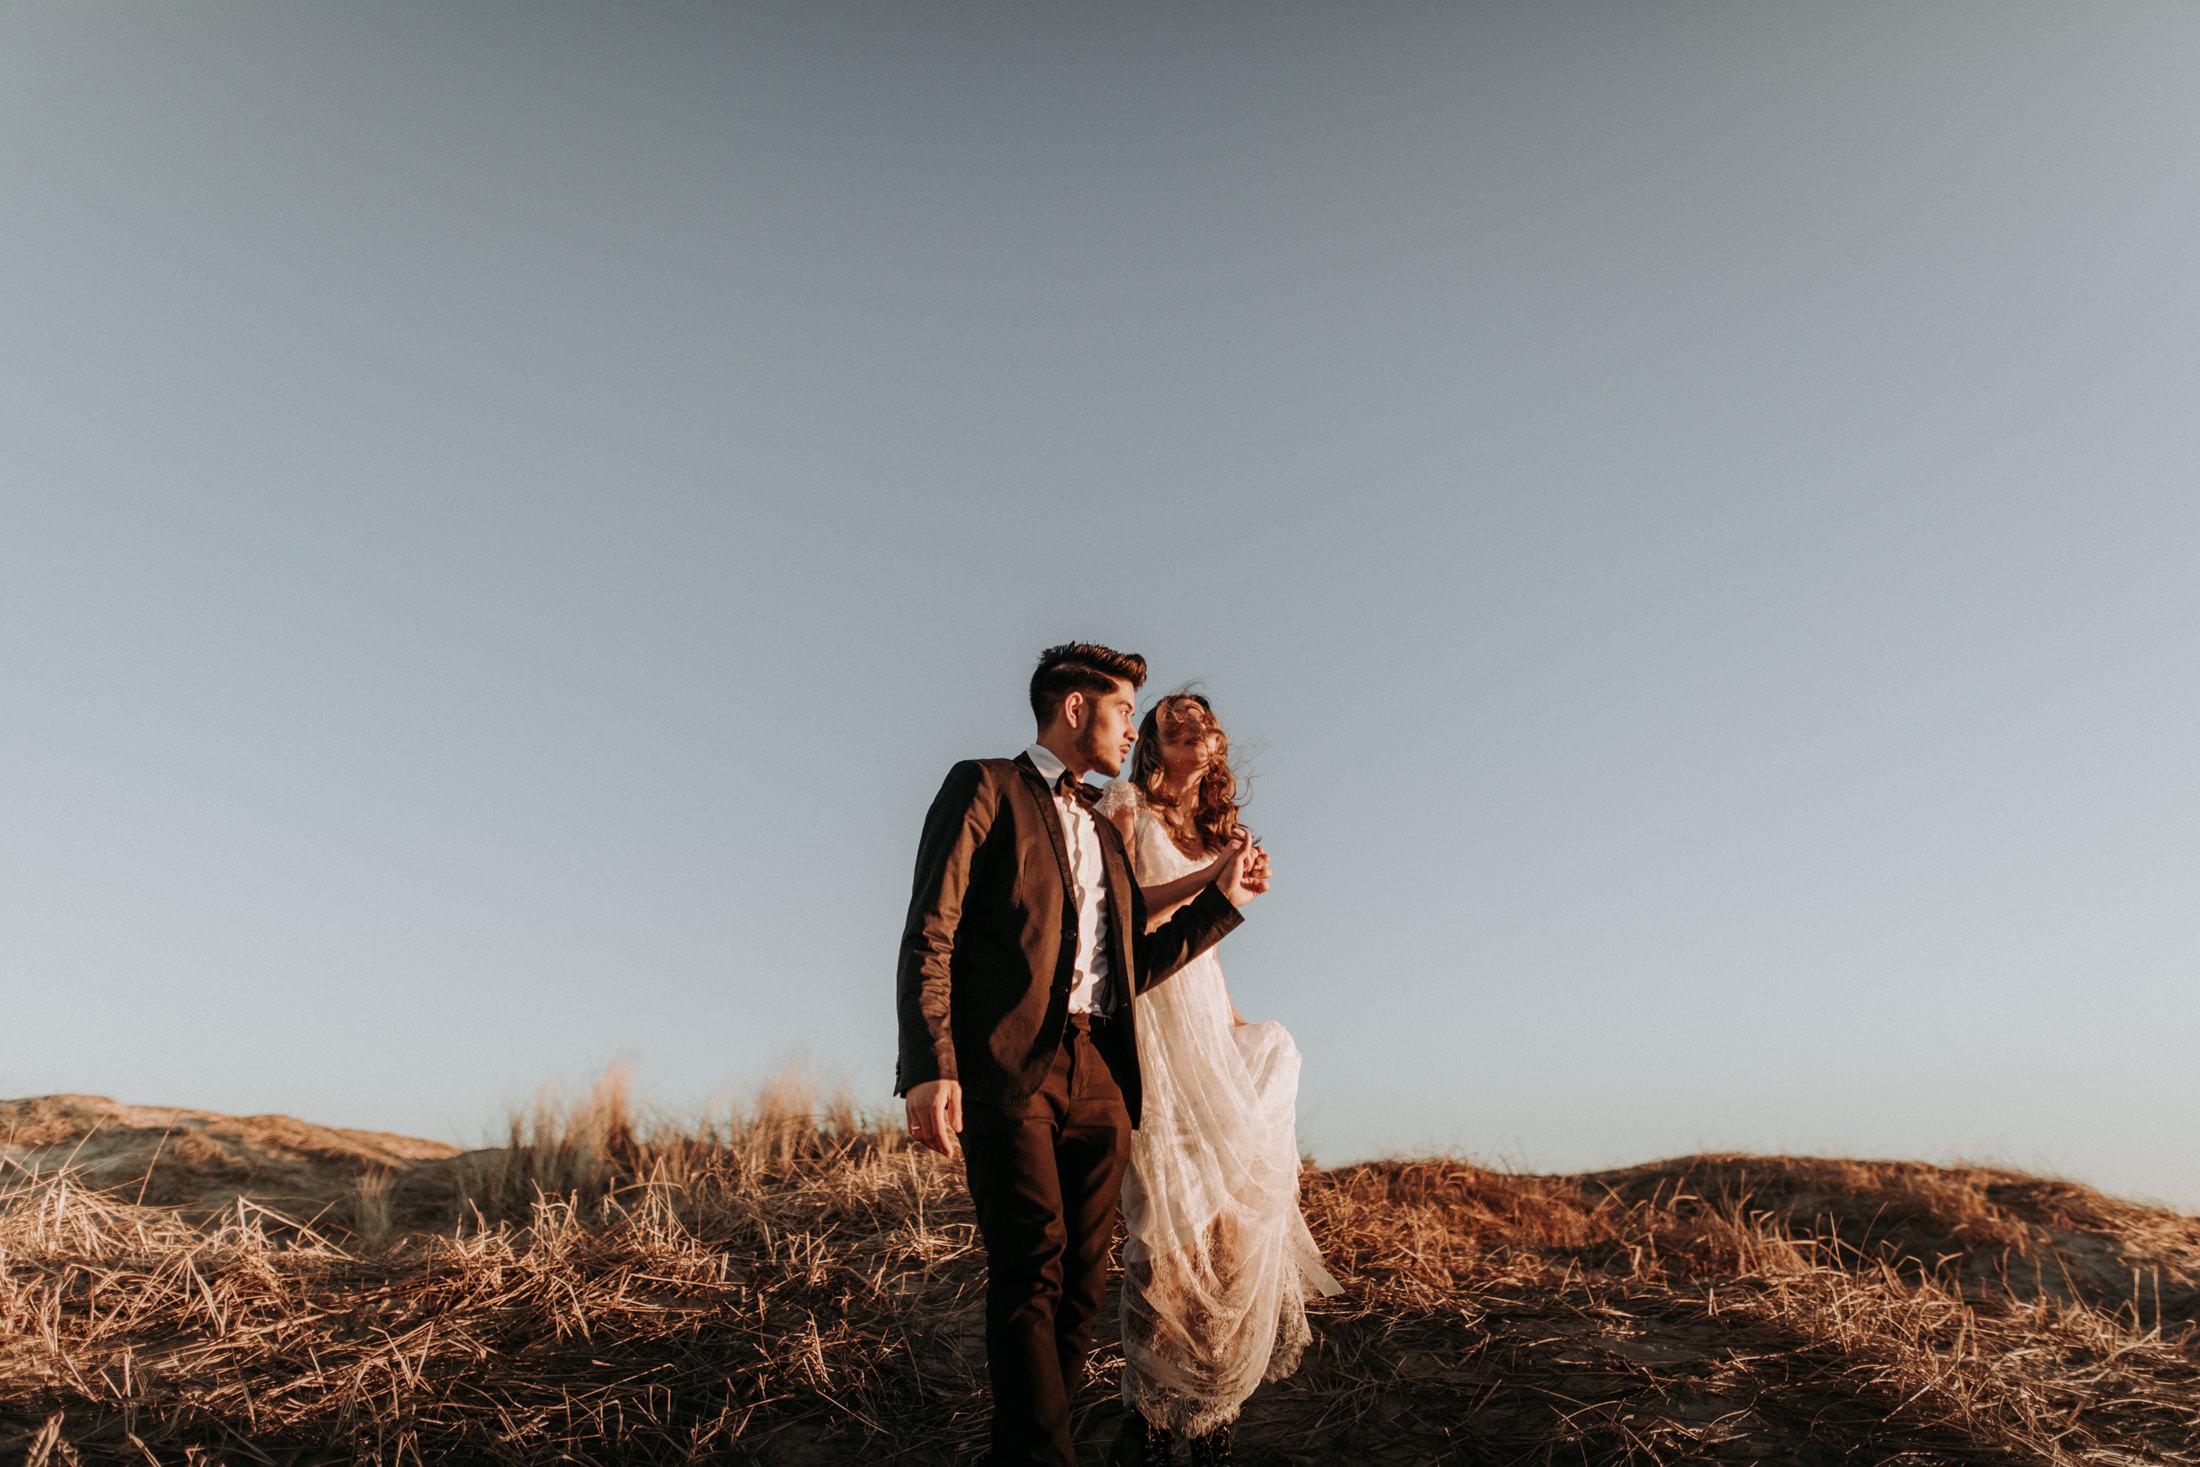 Wedding_Photographer_Mallorca_Daniela-Marquardt_Photography_CanaryIslands_Lanzarote_Iceland_Tuskany_Santorini_Portugal_Schweiz_Austria_Bayern_Elopement_Hochzeitsfotograf_Norddeichich_51